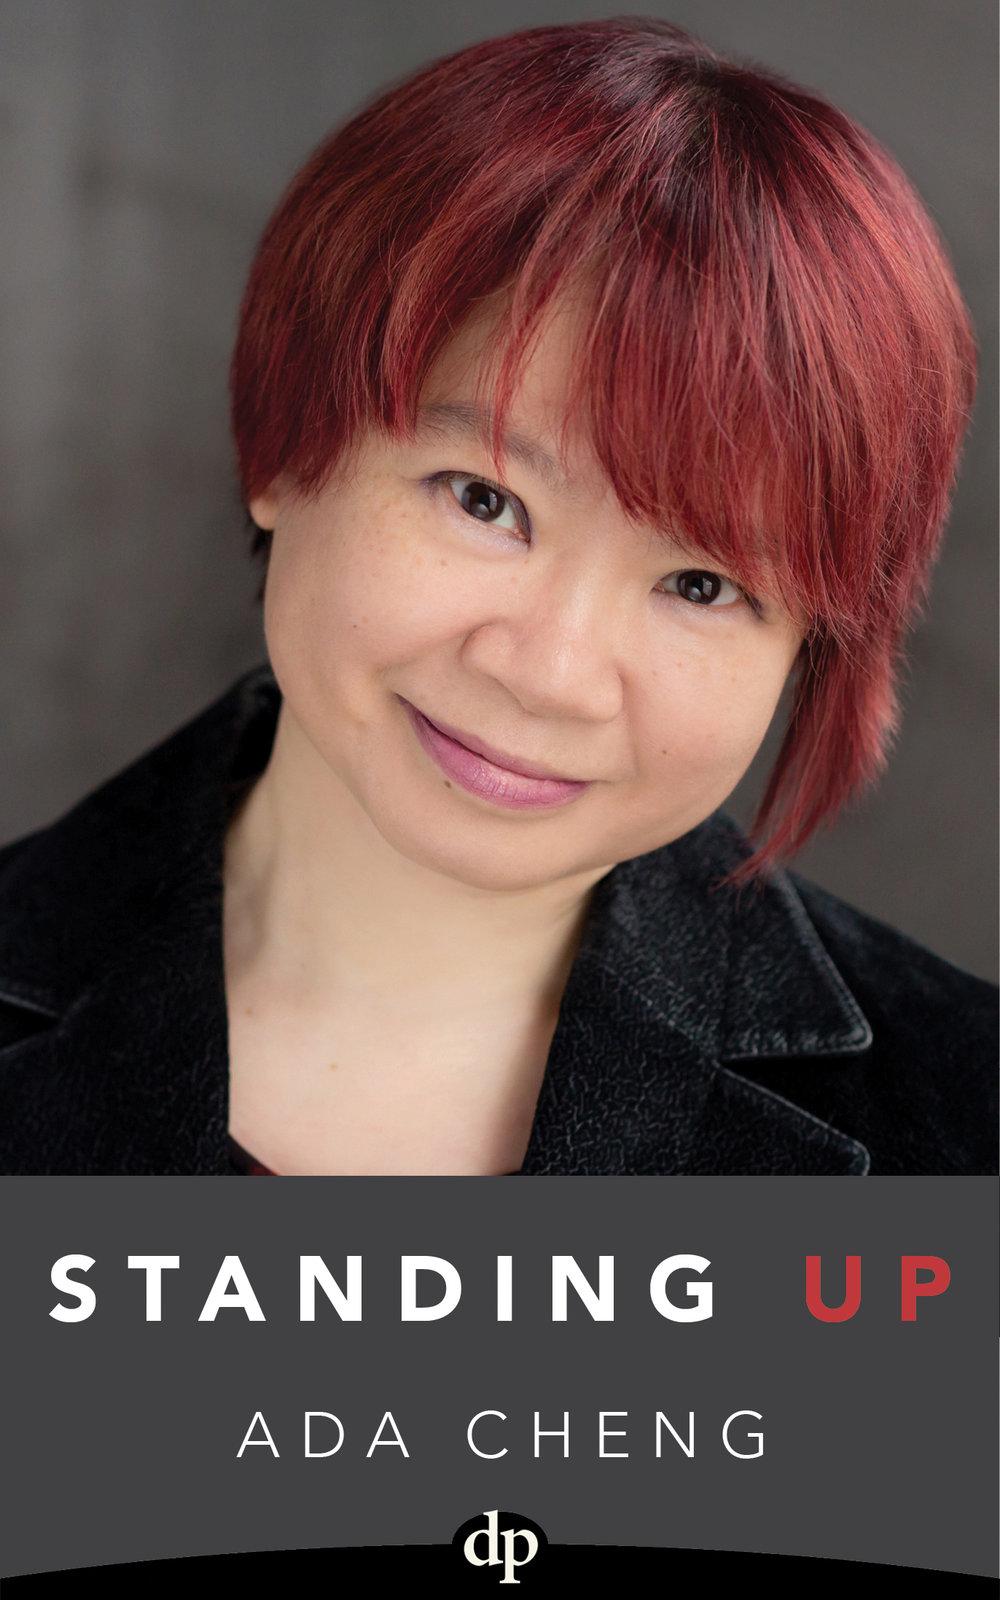 CHENG_Standing Up-ebk-Approved.jpg